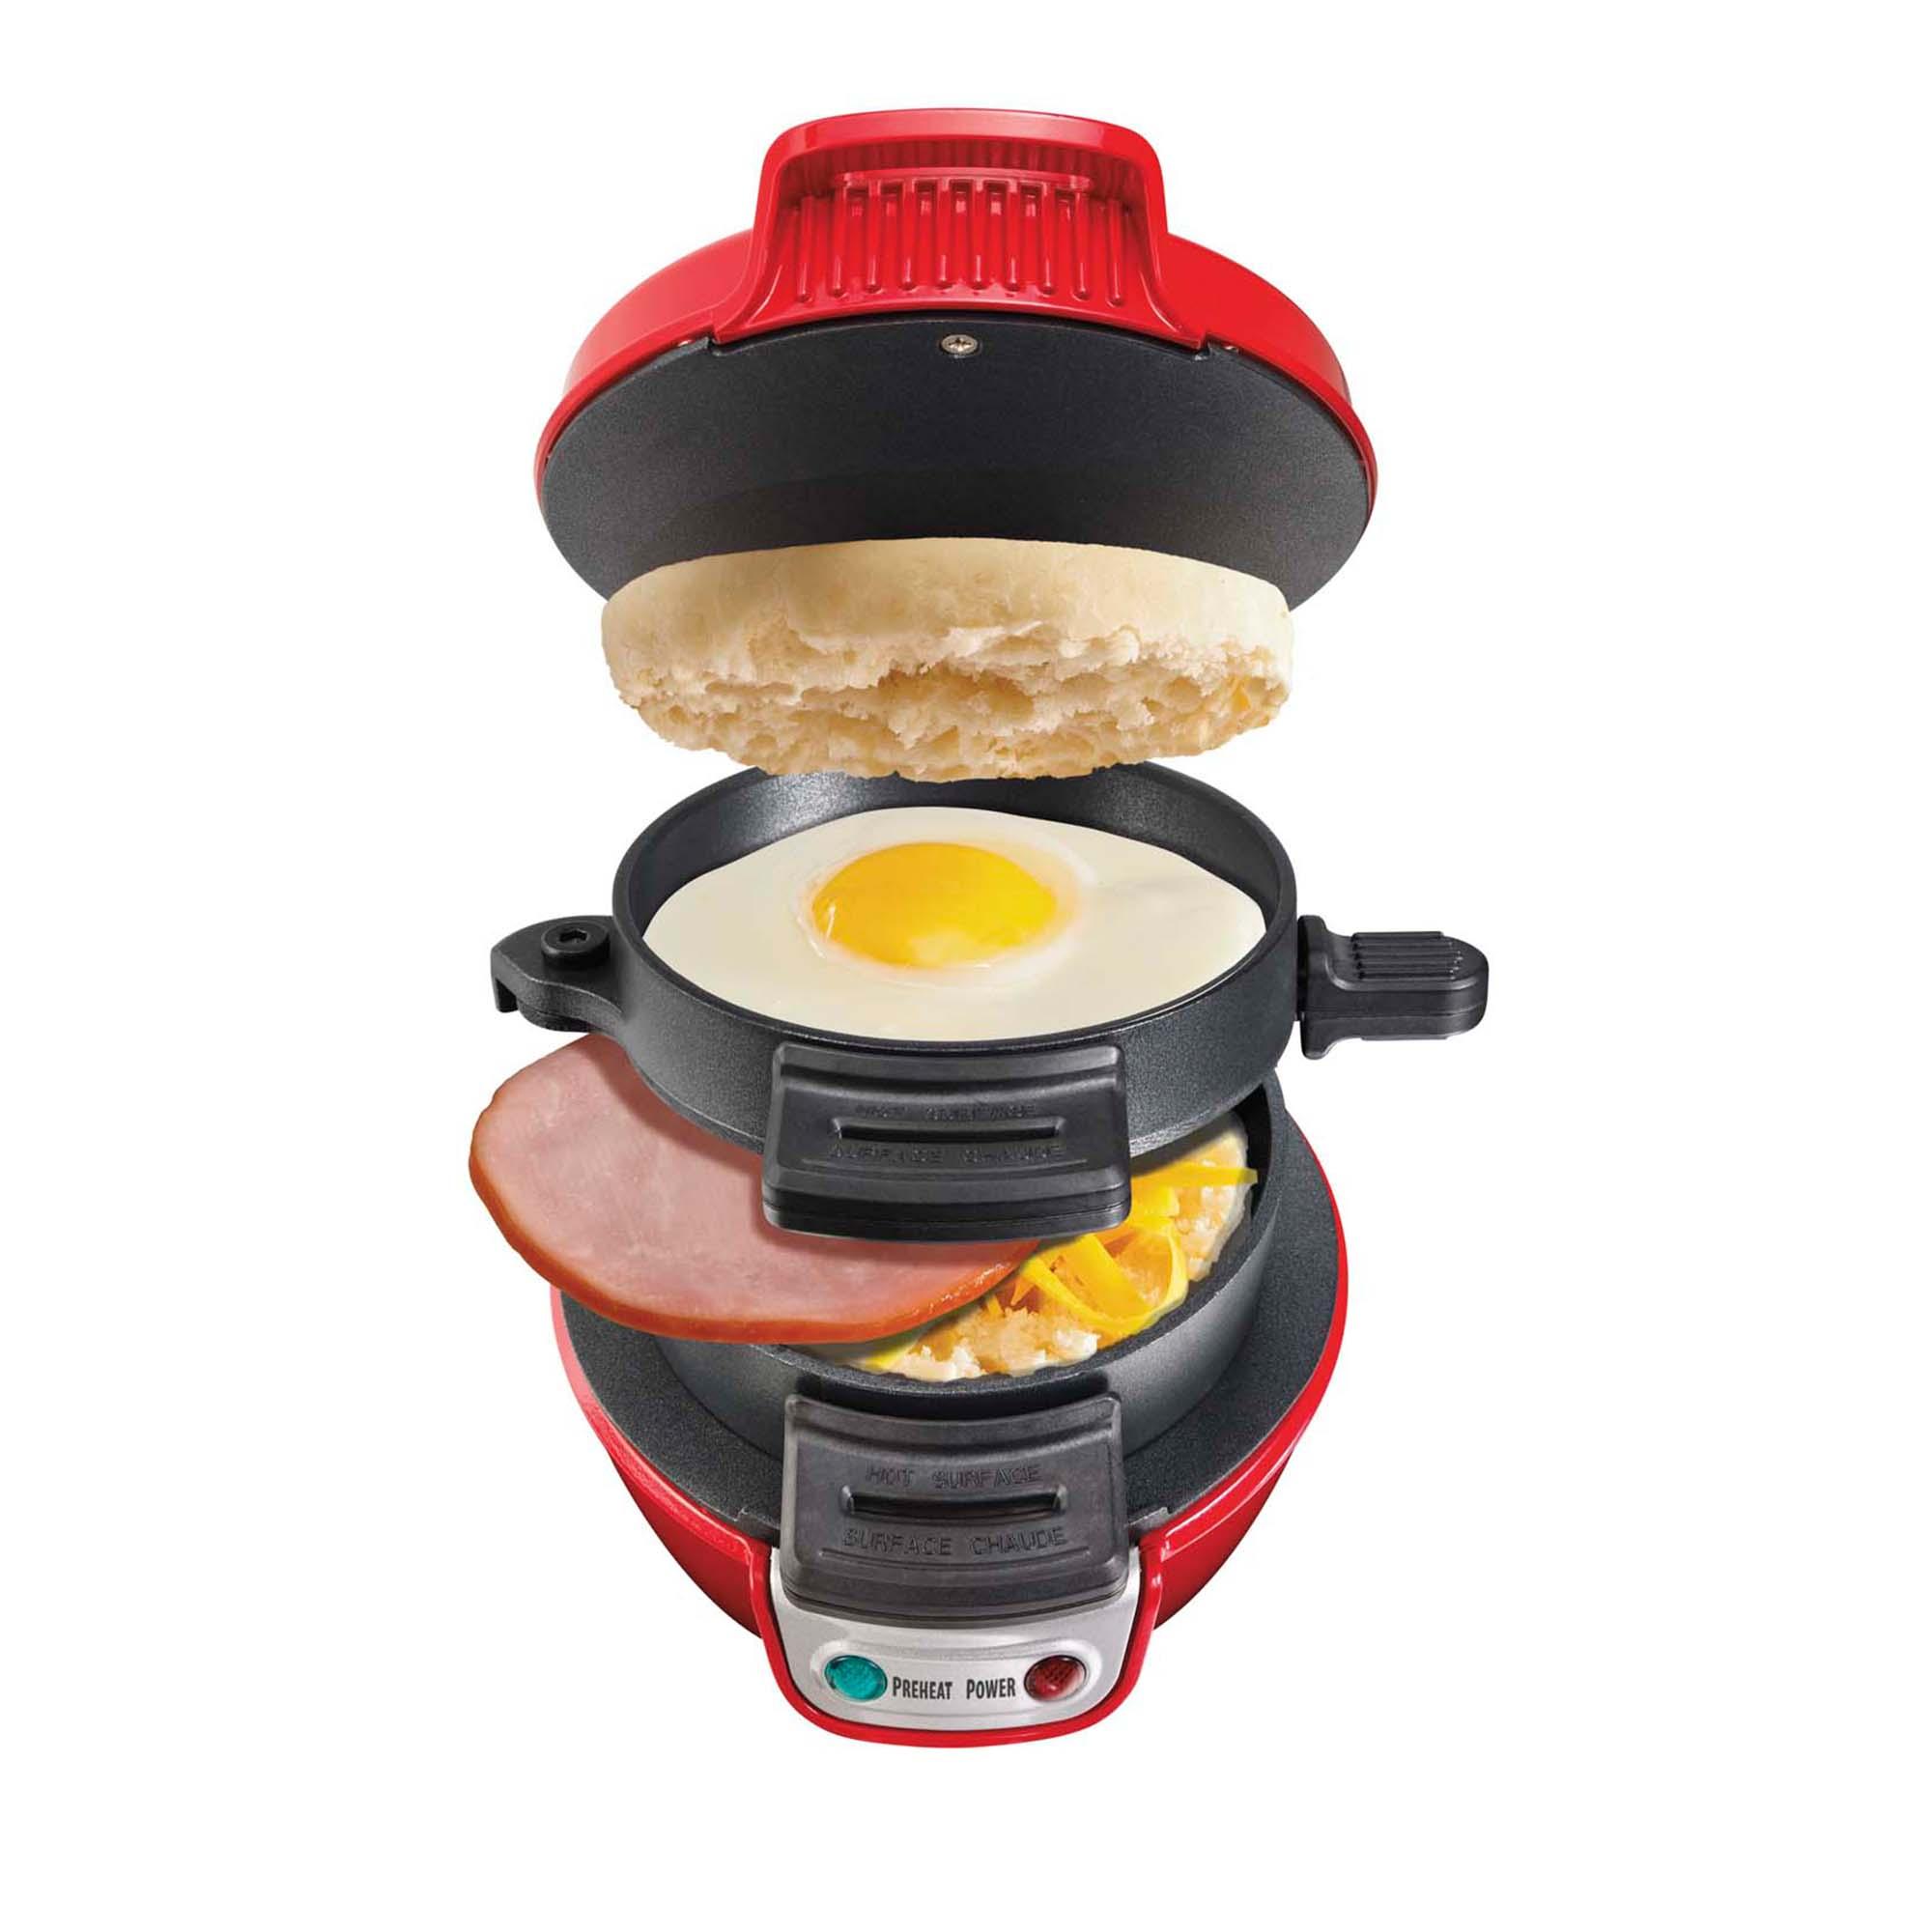 Hamilton Beach Breakfast Sandwich Maker Kitchen Counter